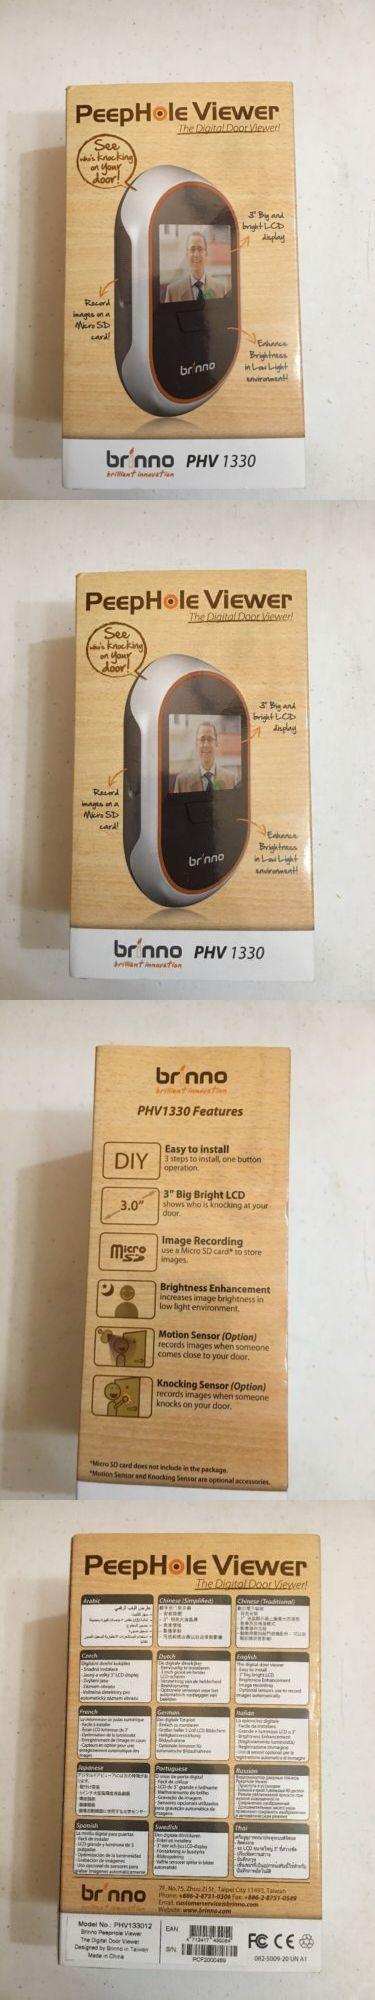 Other Home Surveillance: Brinno Phv1330 Hidden Front Door Camera -> BUY IT NOW ONLY: $129.99 on eBay!